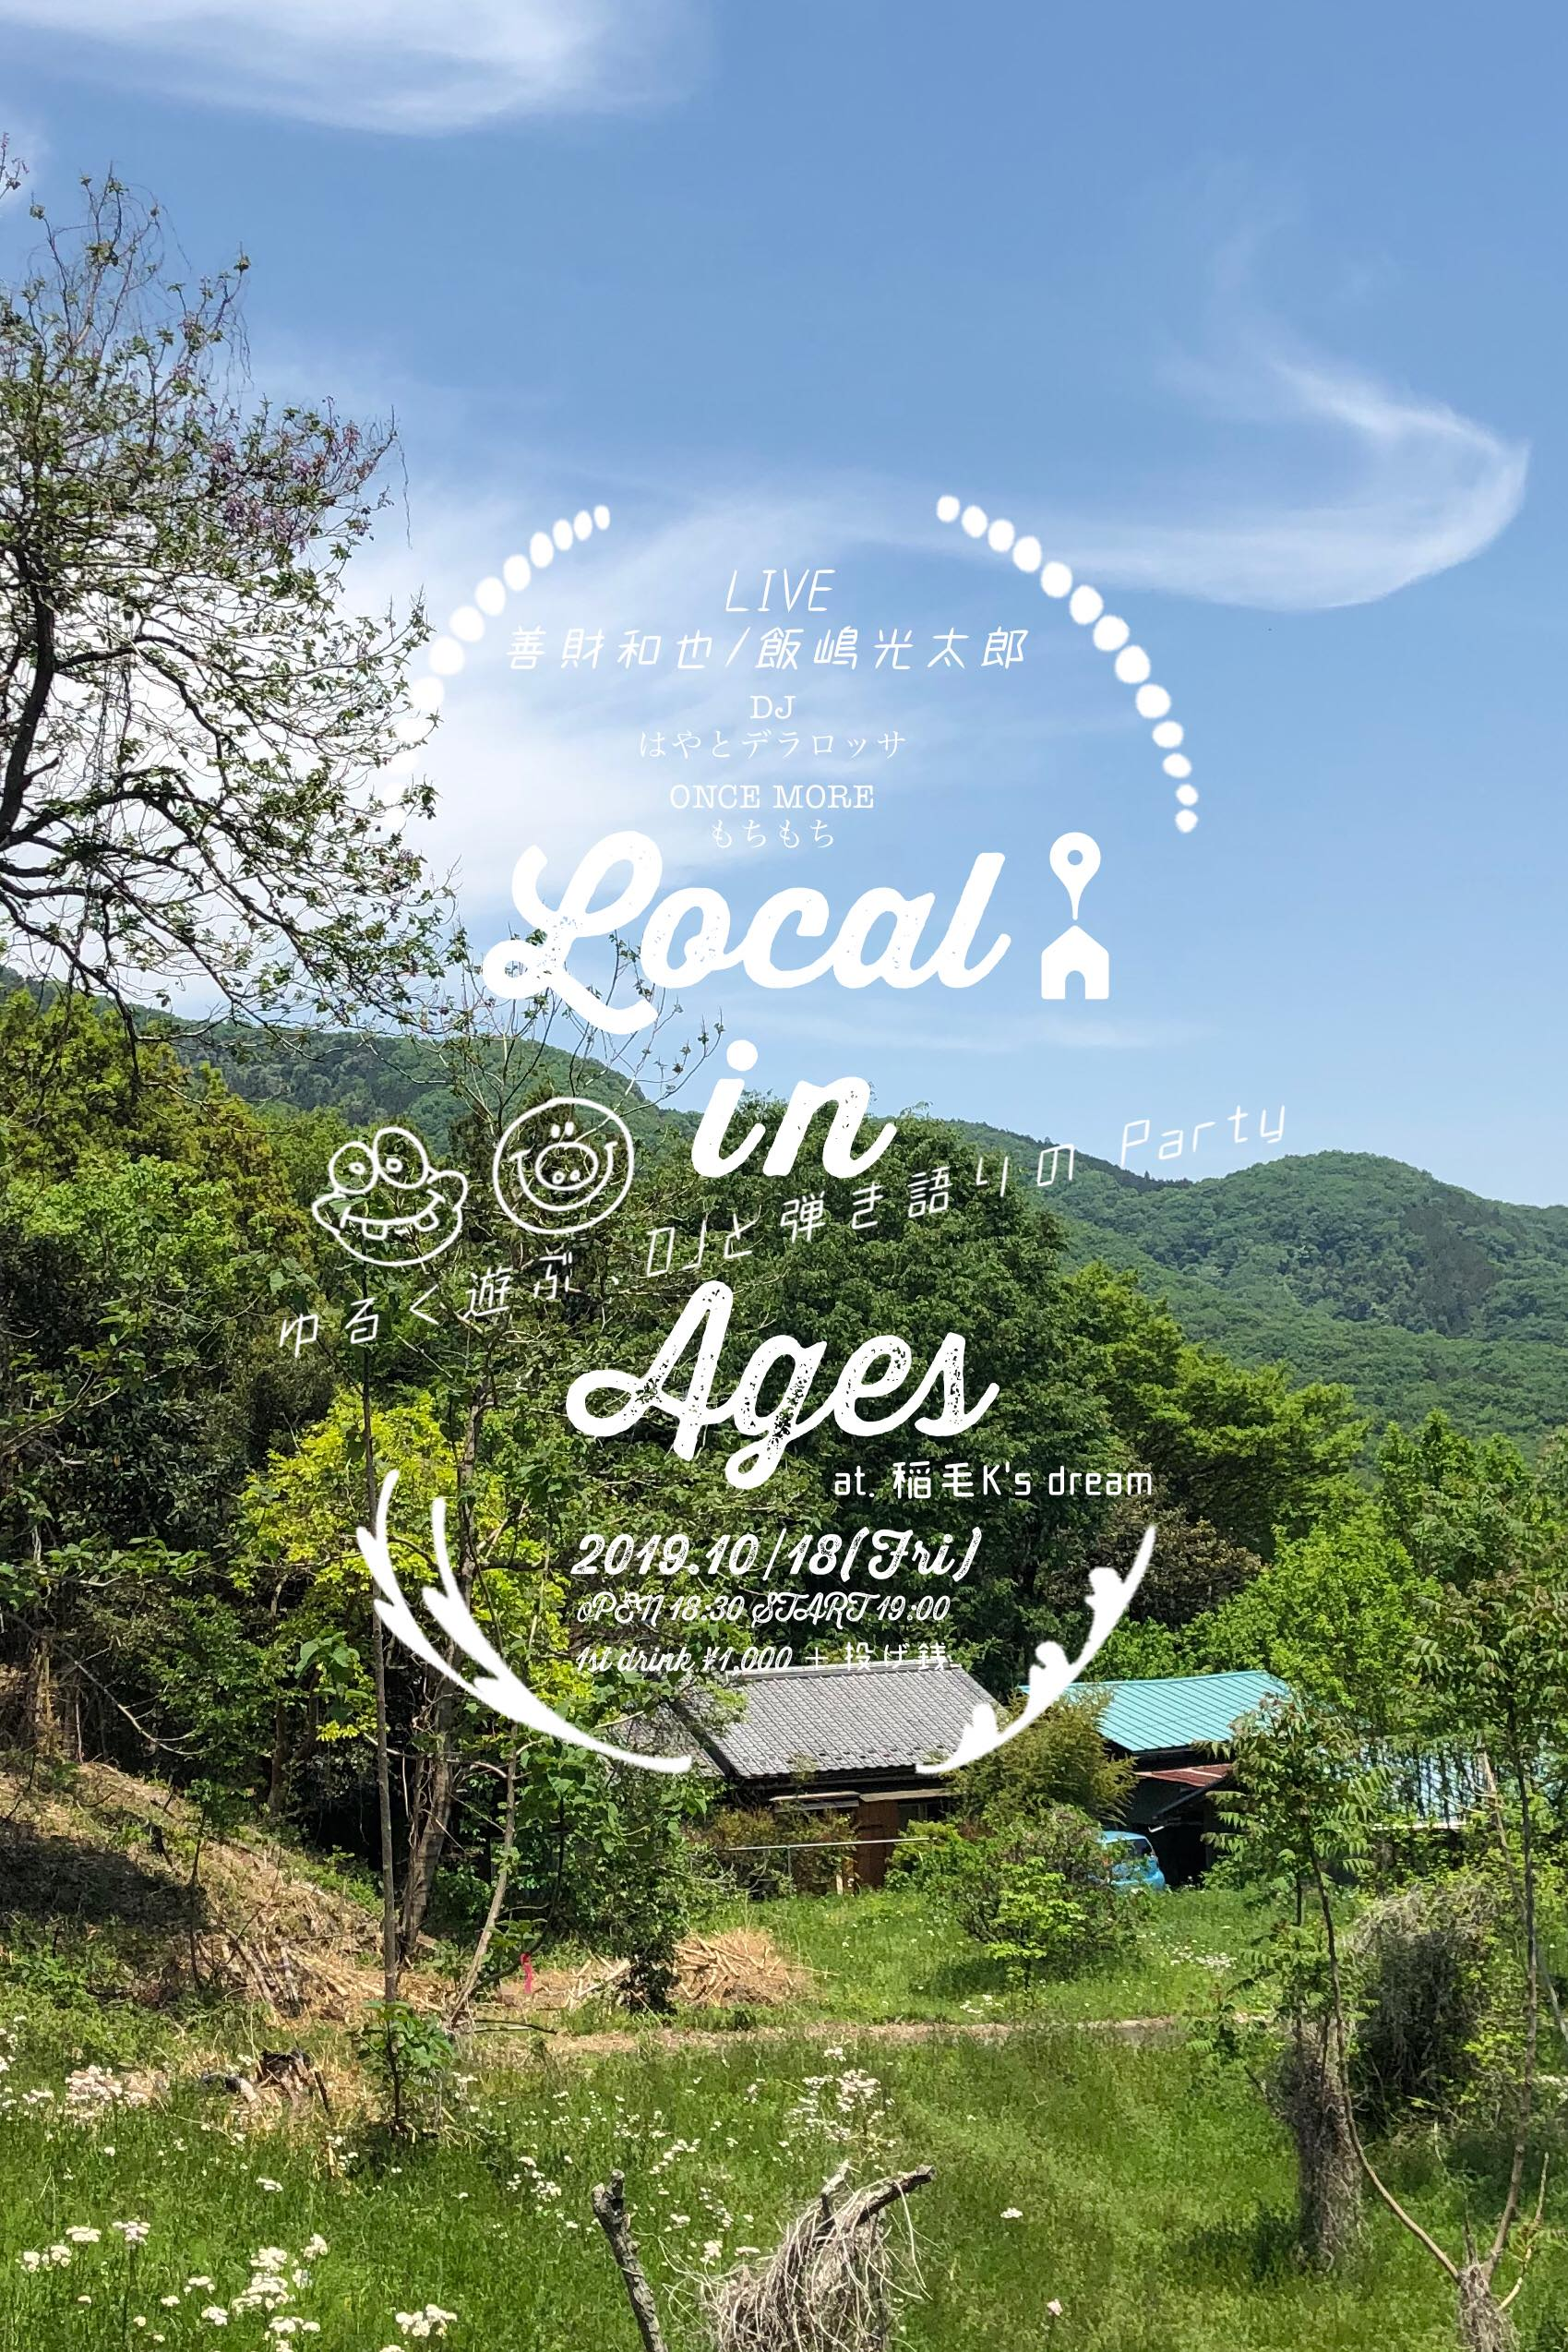 10/18(Fri) 『Local in Ages』 @稲毛K's dream START 19:00